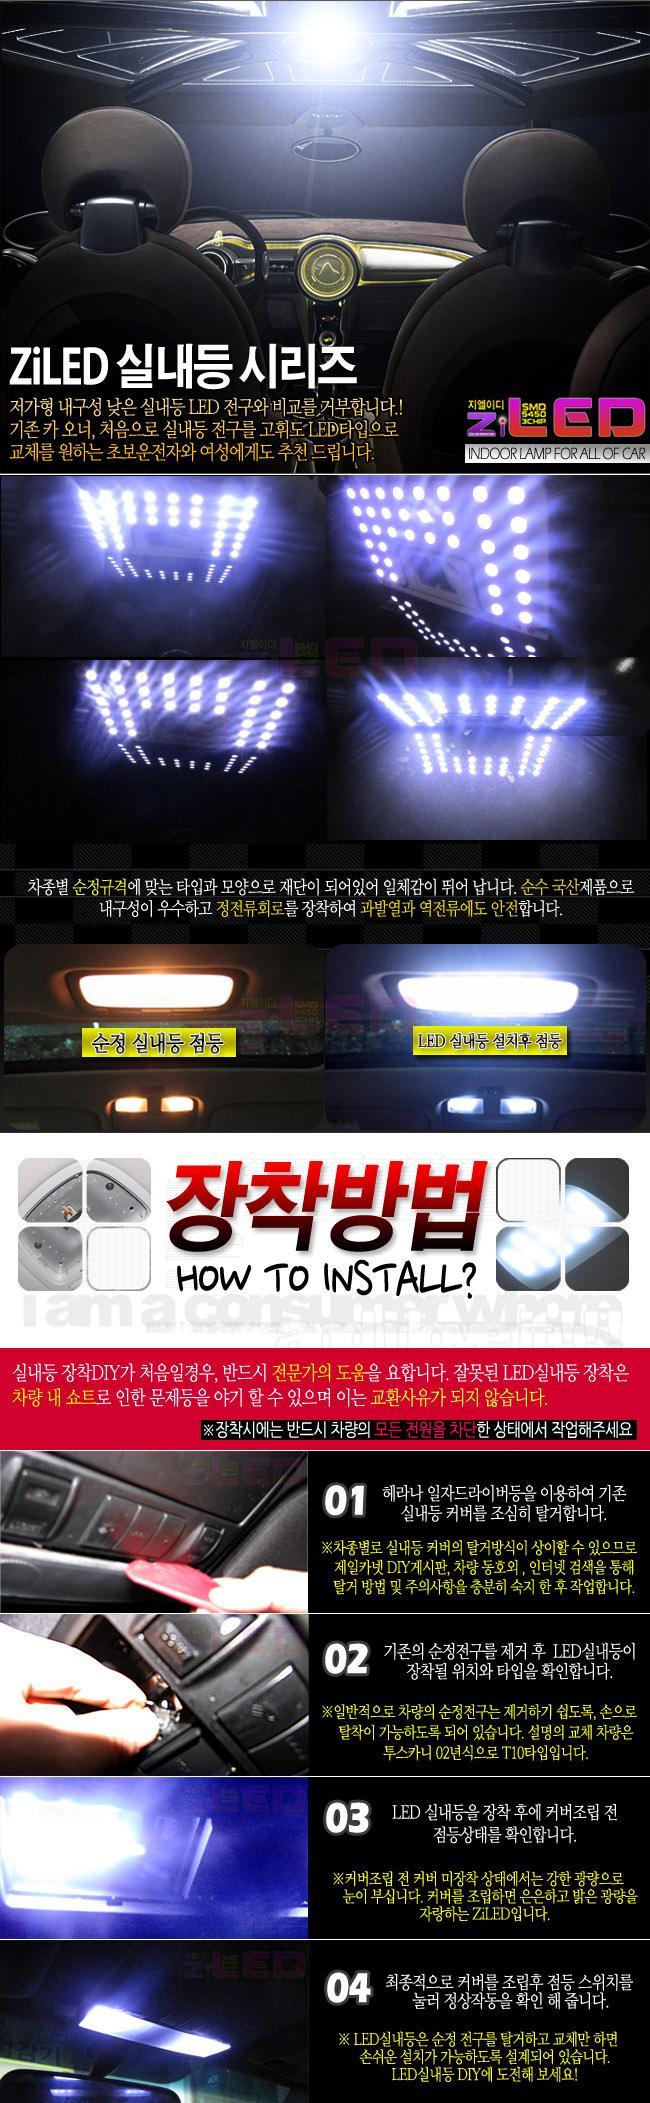 ZiLED LED실내등 시공방법